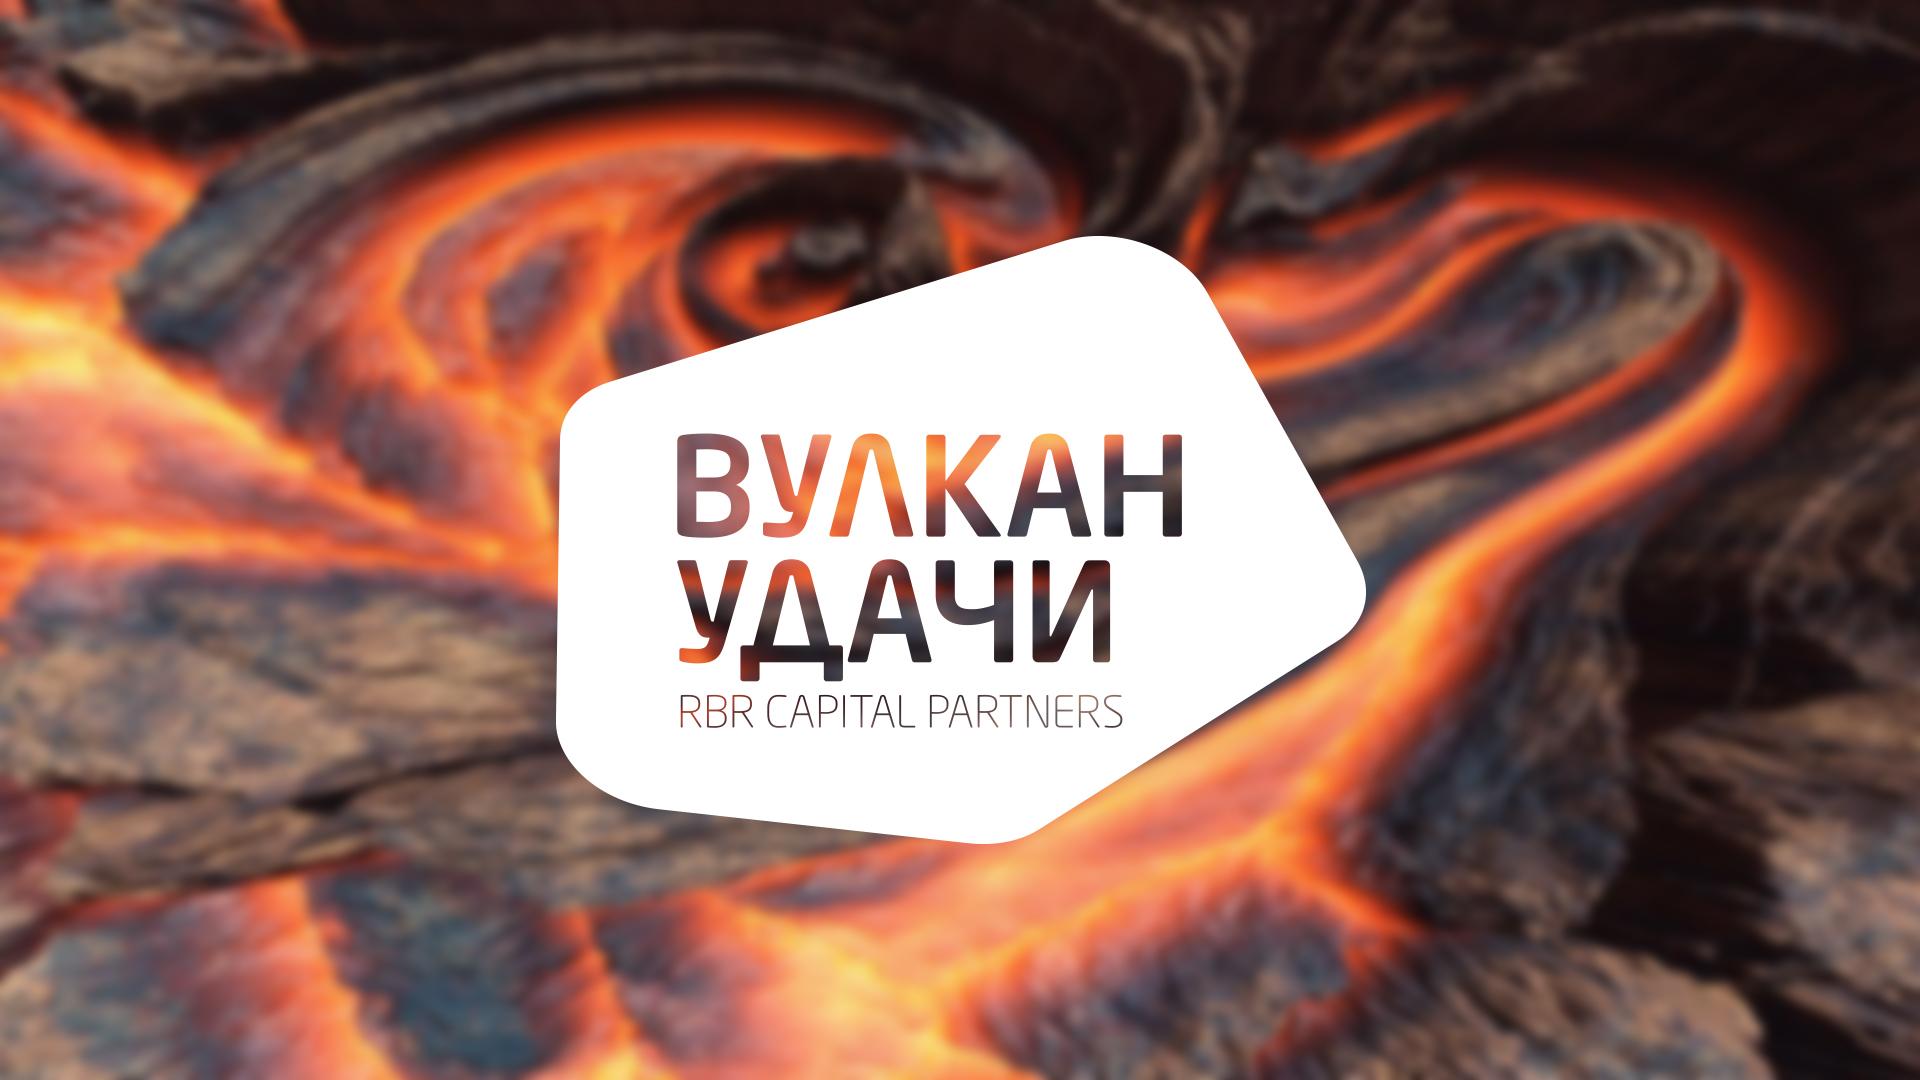 Разработка логотипа для брокерской компании ВУЛКАН УДАЧИ фото f_41351ab8fe66a4bb.jpg